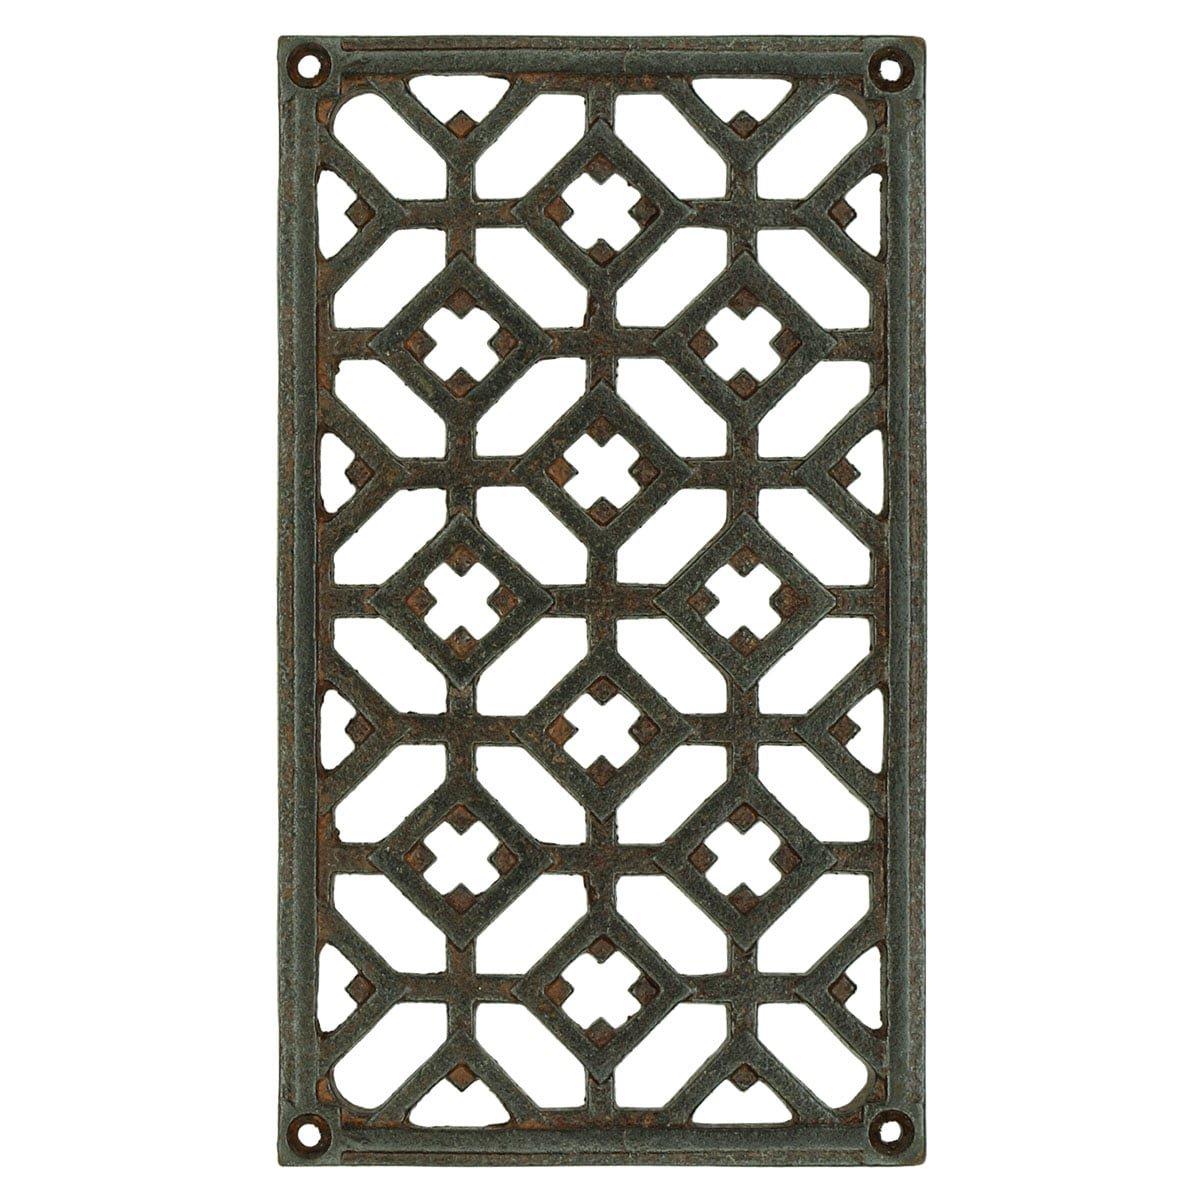 Hardware Grilles & Grates Cover grate front door iron Coburg - 240 mm